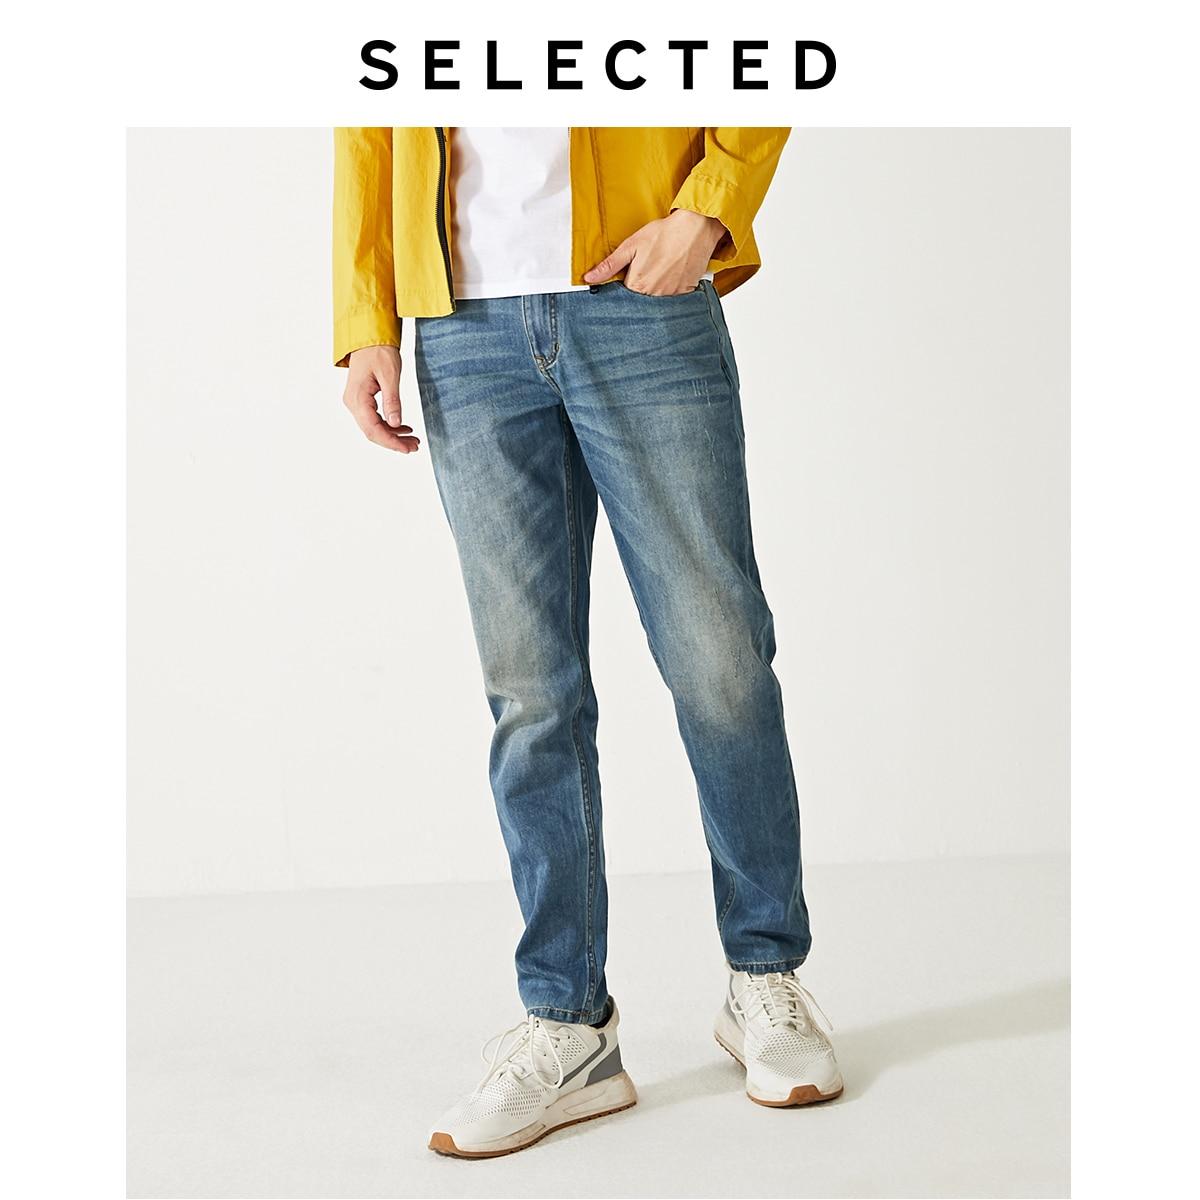 SELECTED Men's Slight Stretch Denim Pants New Regular Casual Tapered Tight-leg Jeans S|419332526